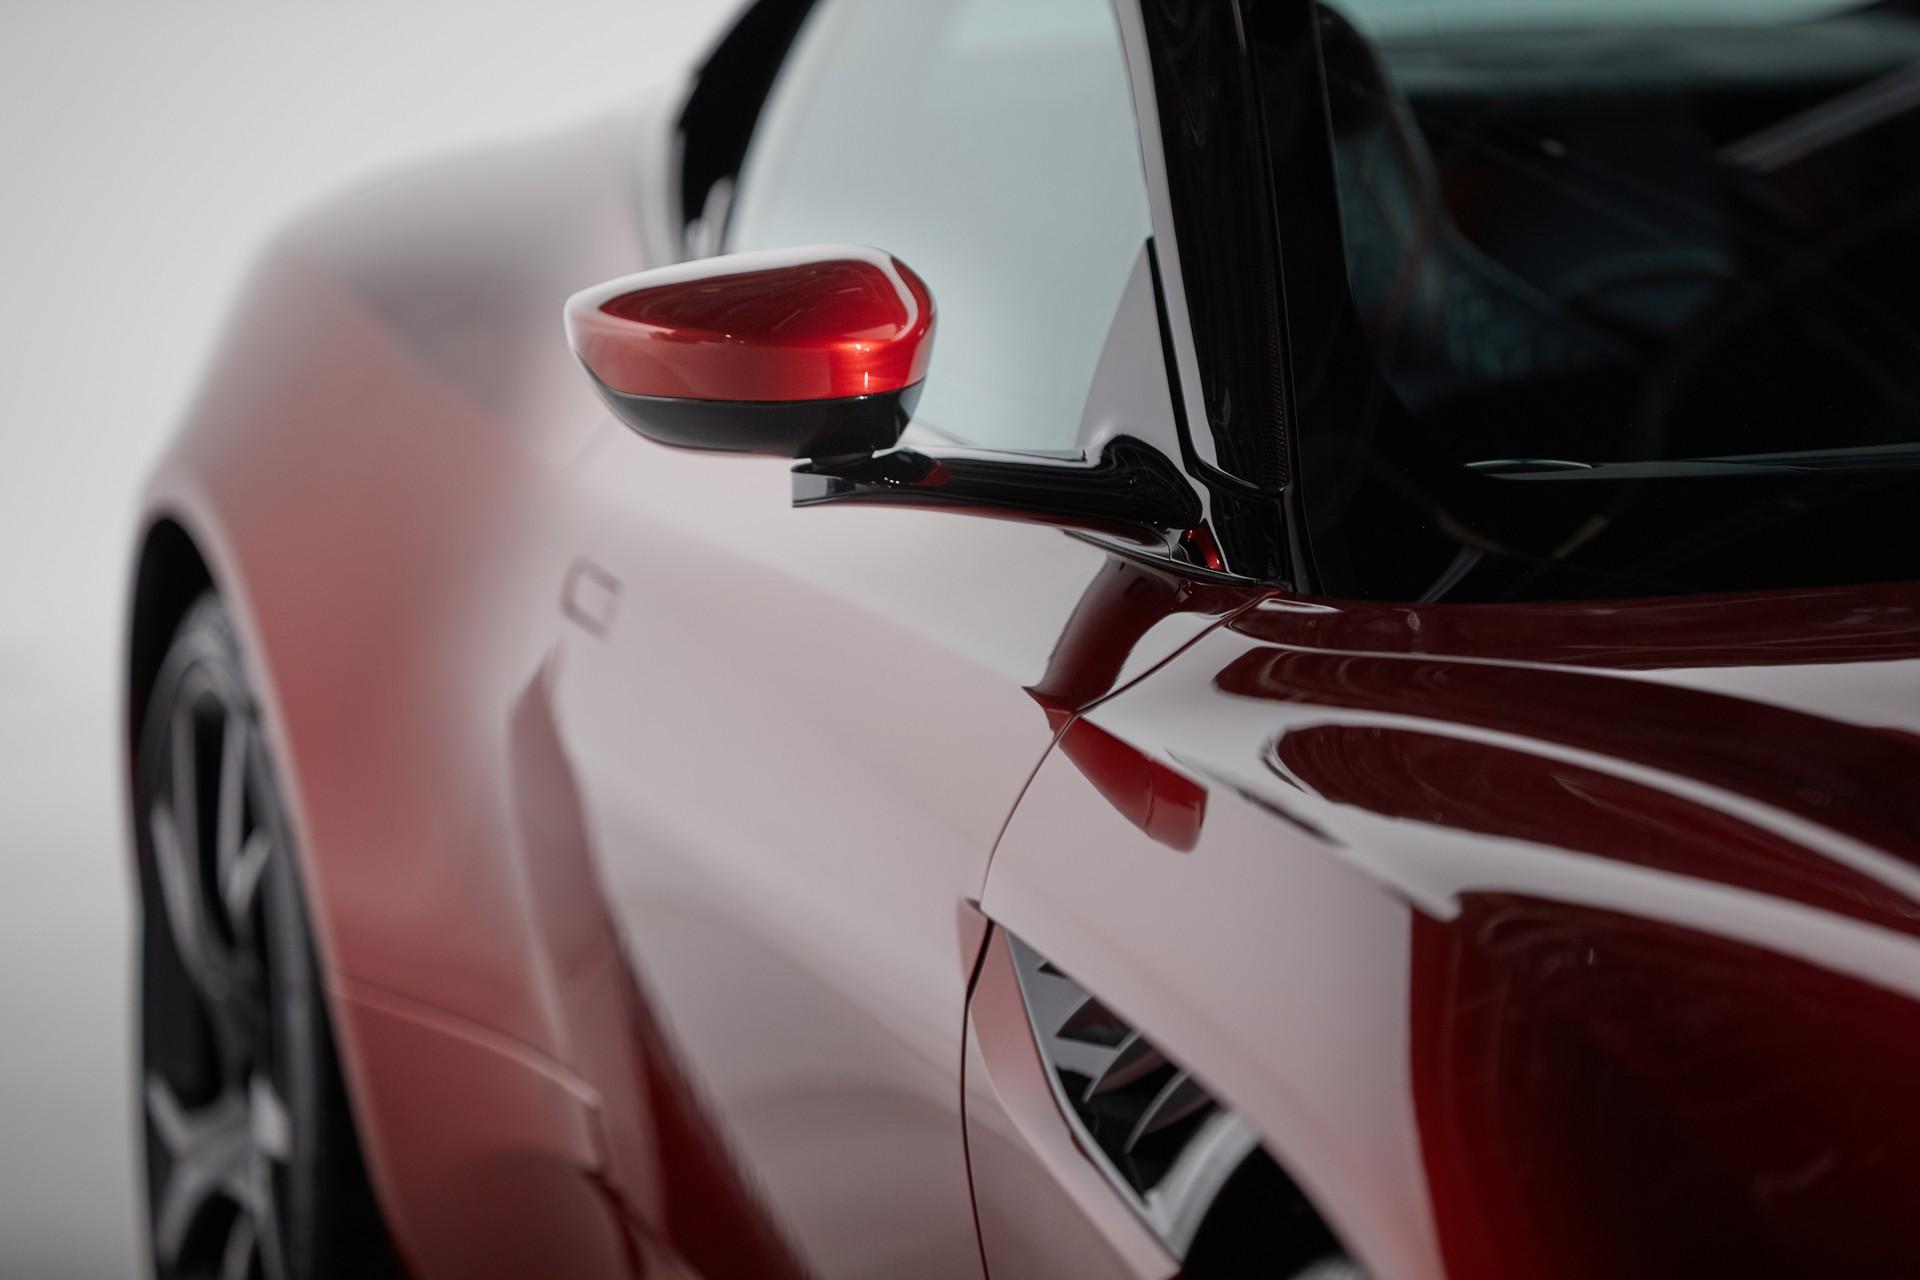 Aston-Martin-tri-camera-rearview-mirror-system-3